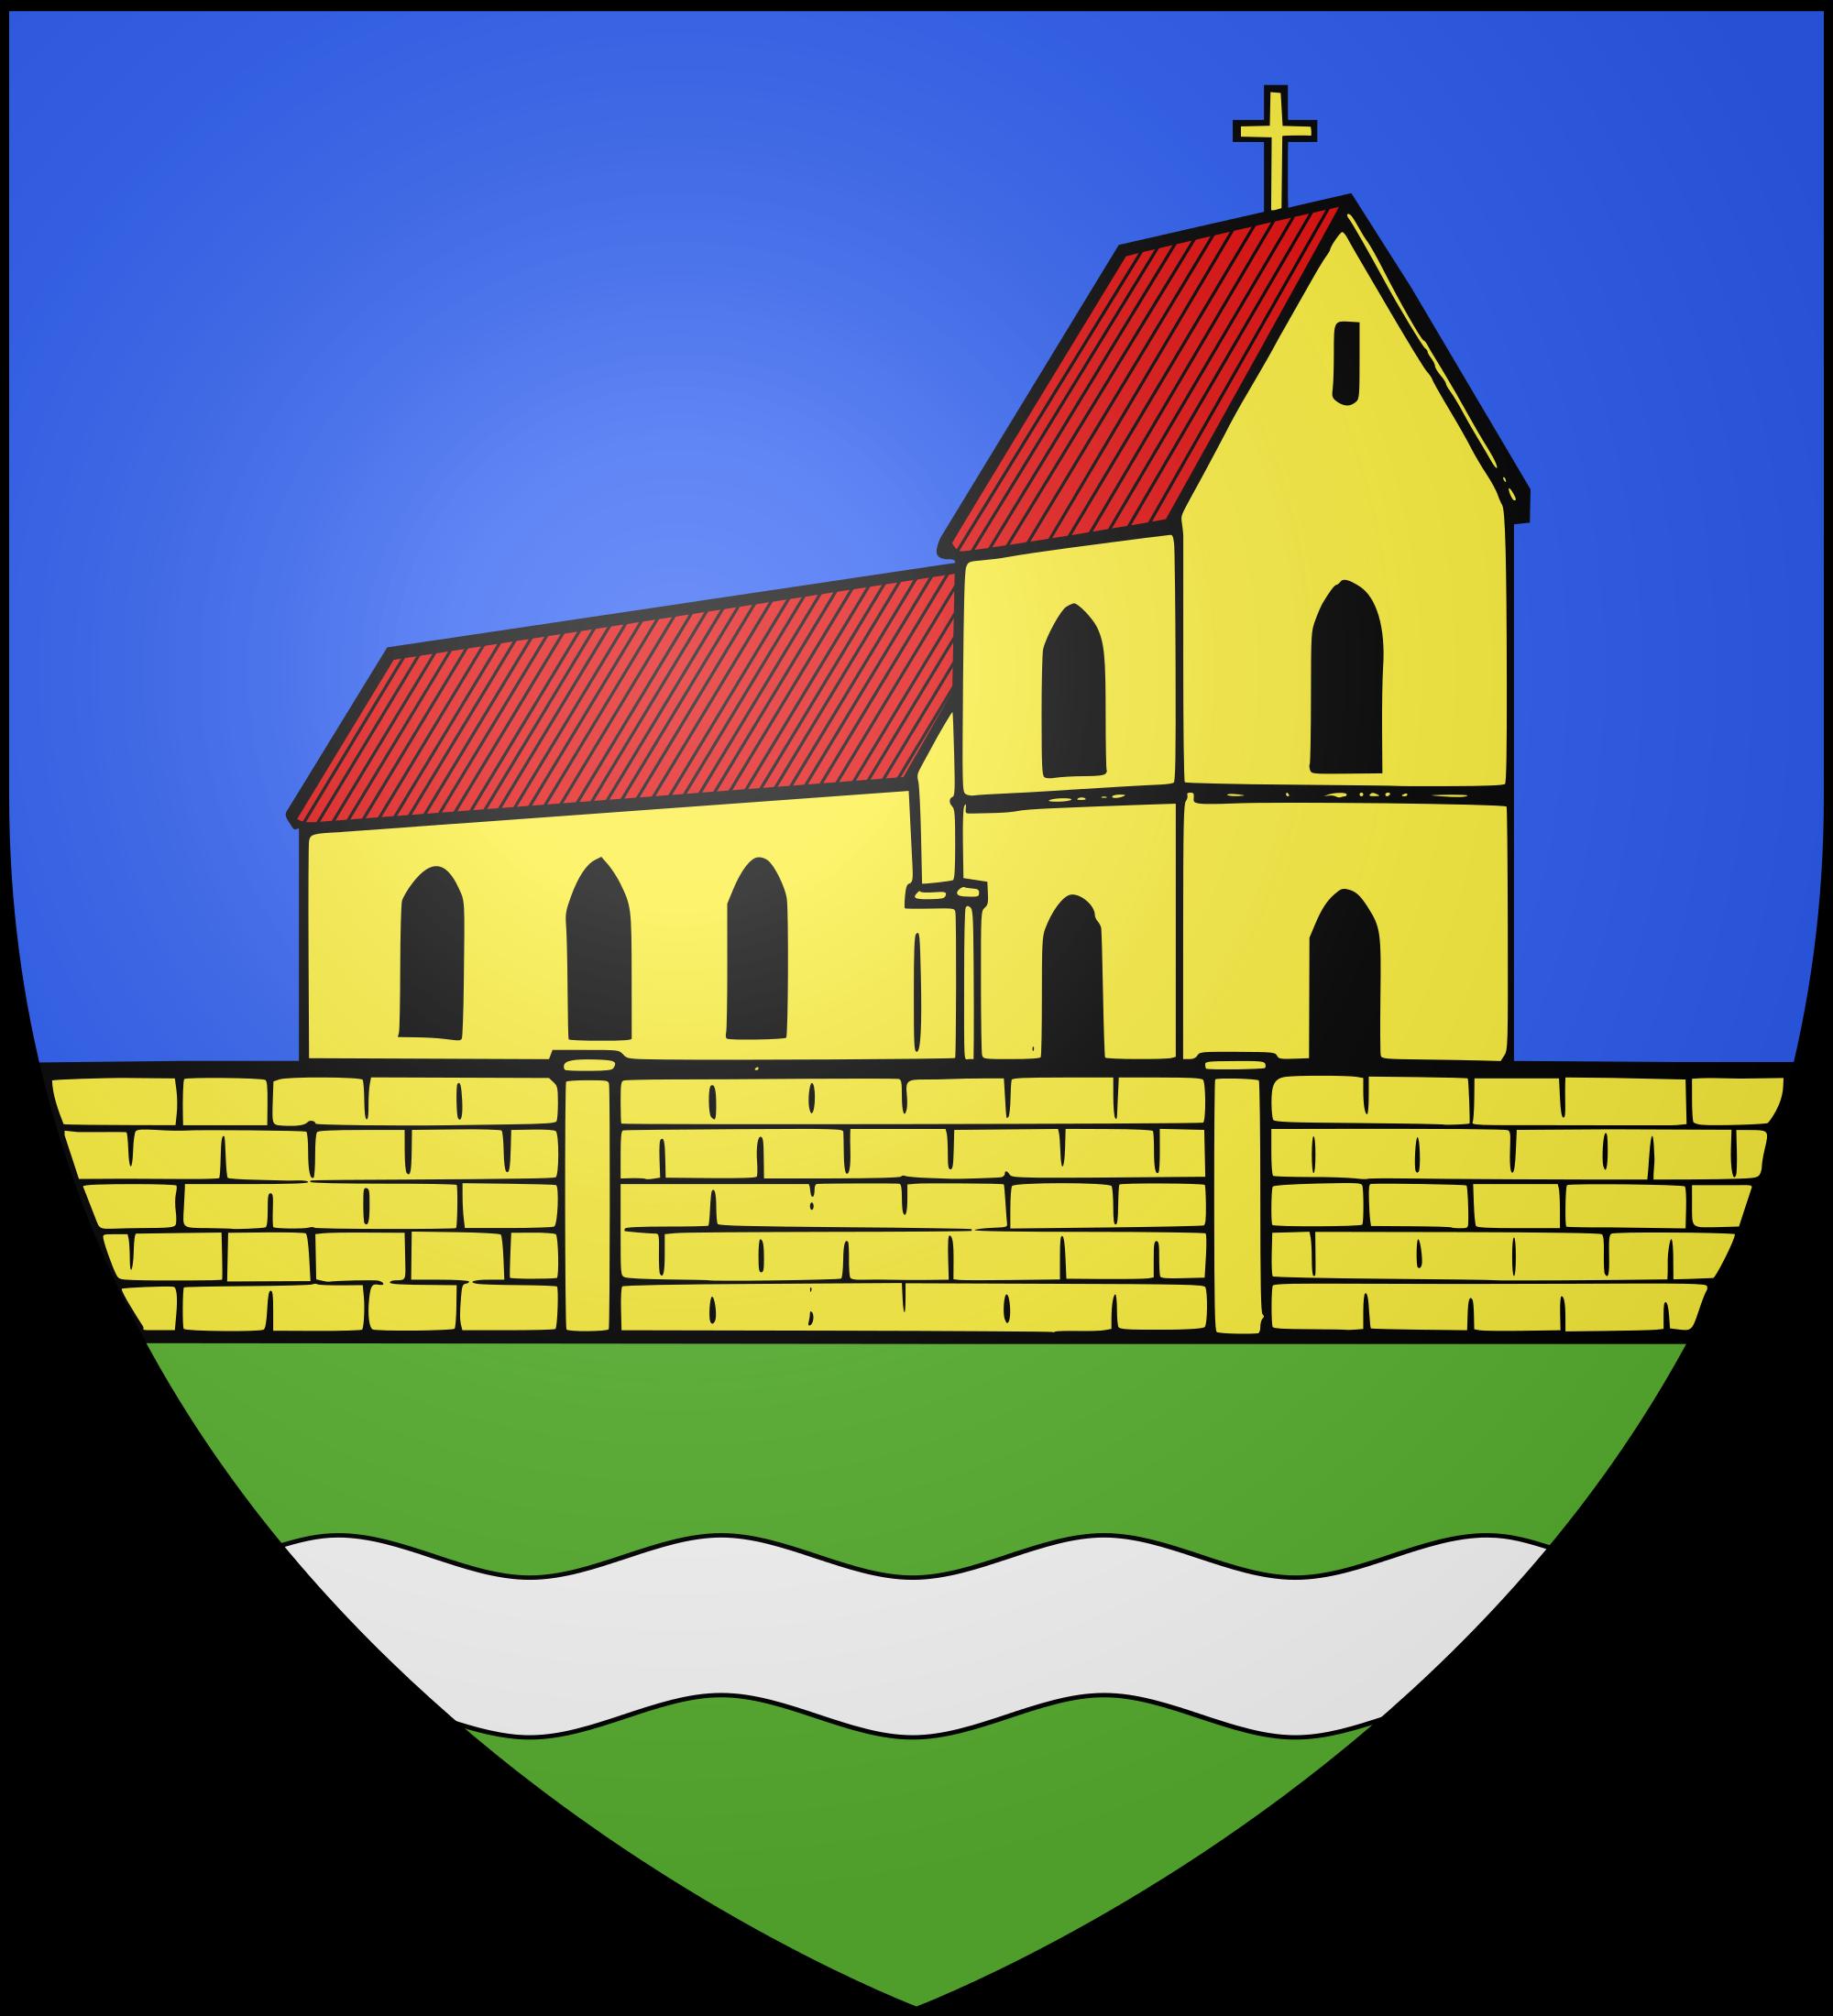 File:Blason de la ville de Kirchberg (68).svg.